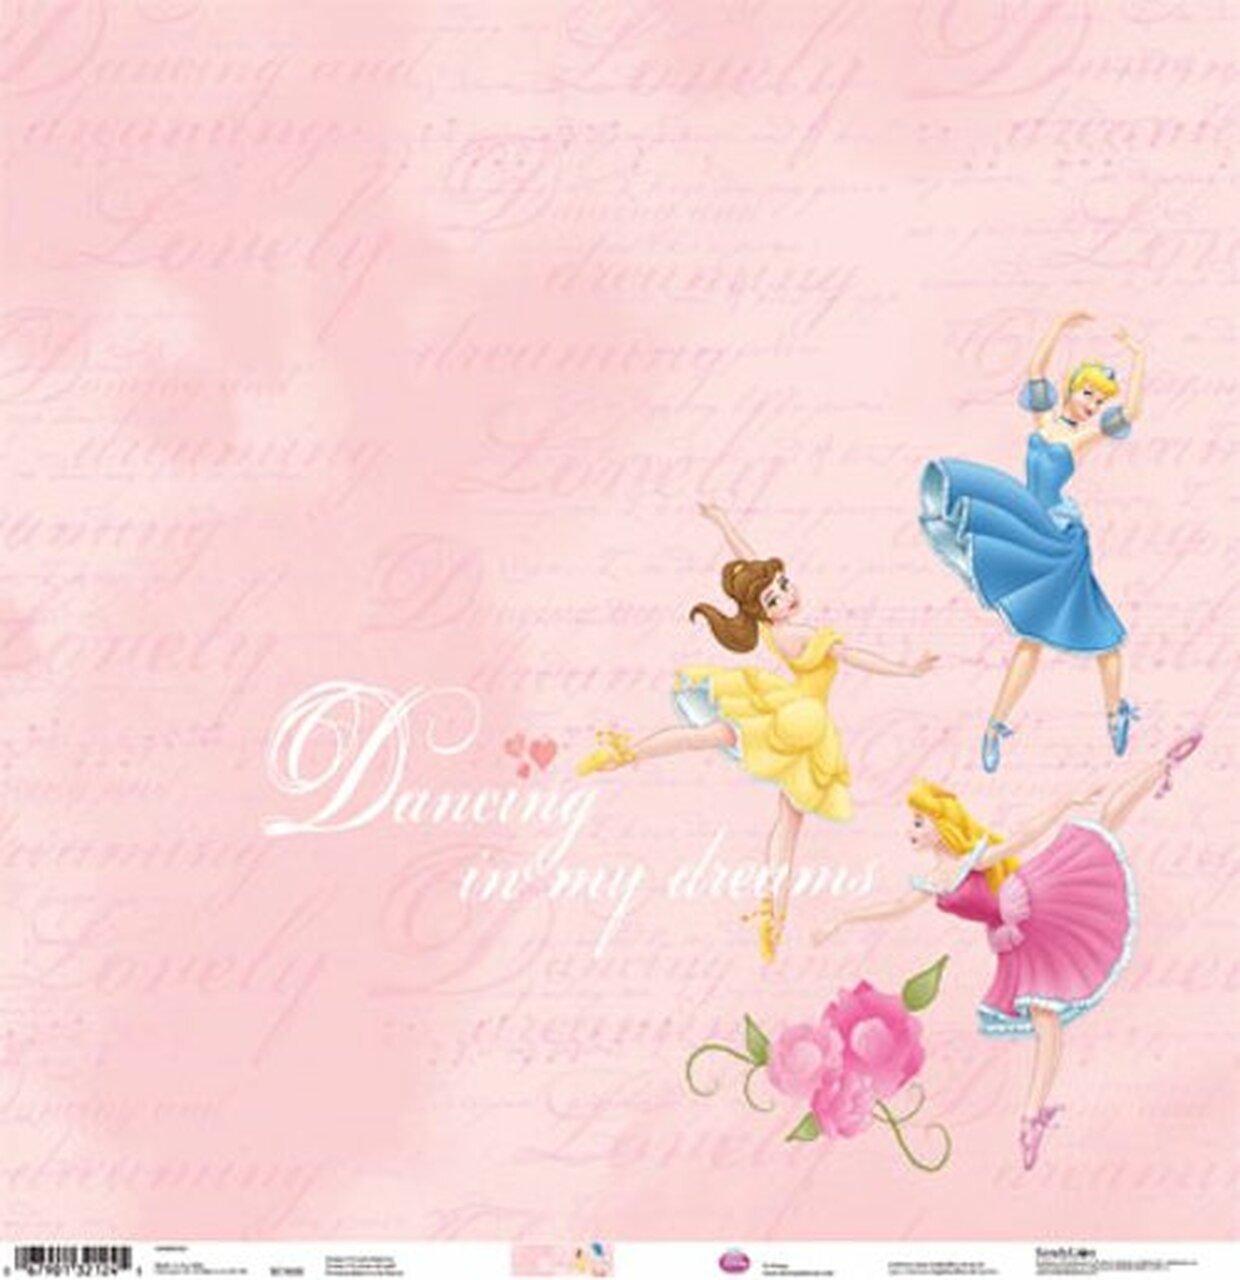 Dancing In My Dreams